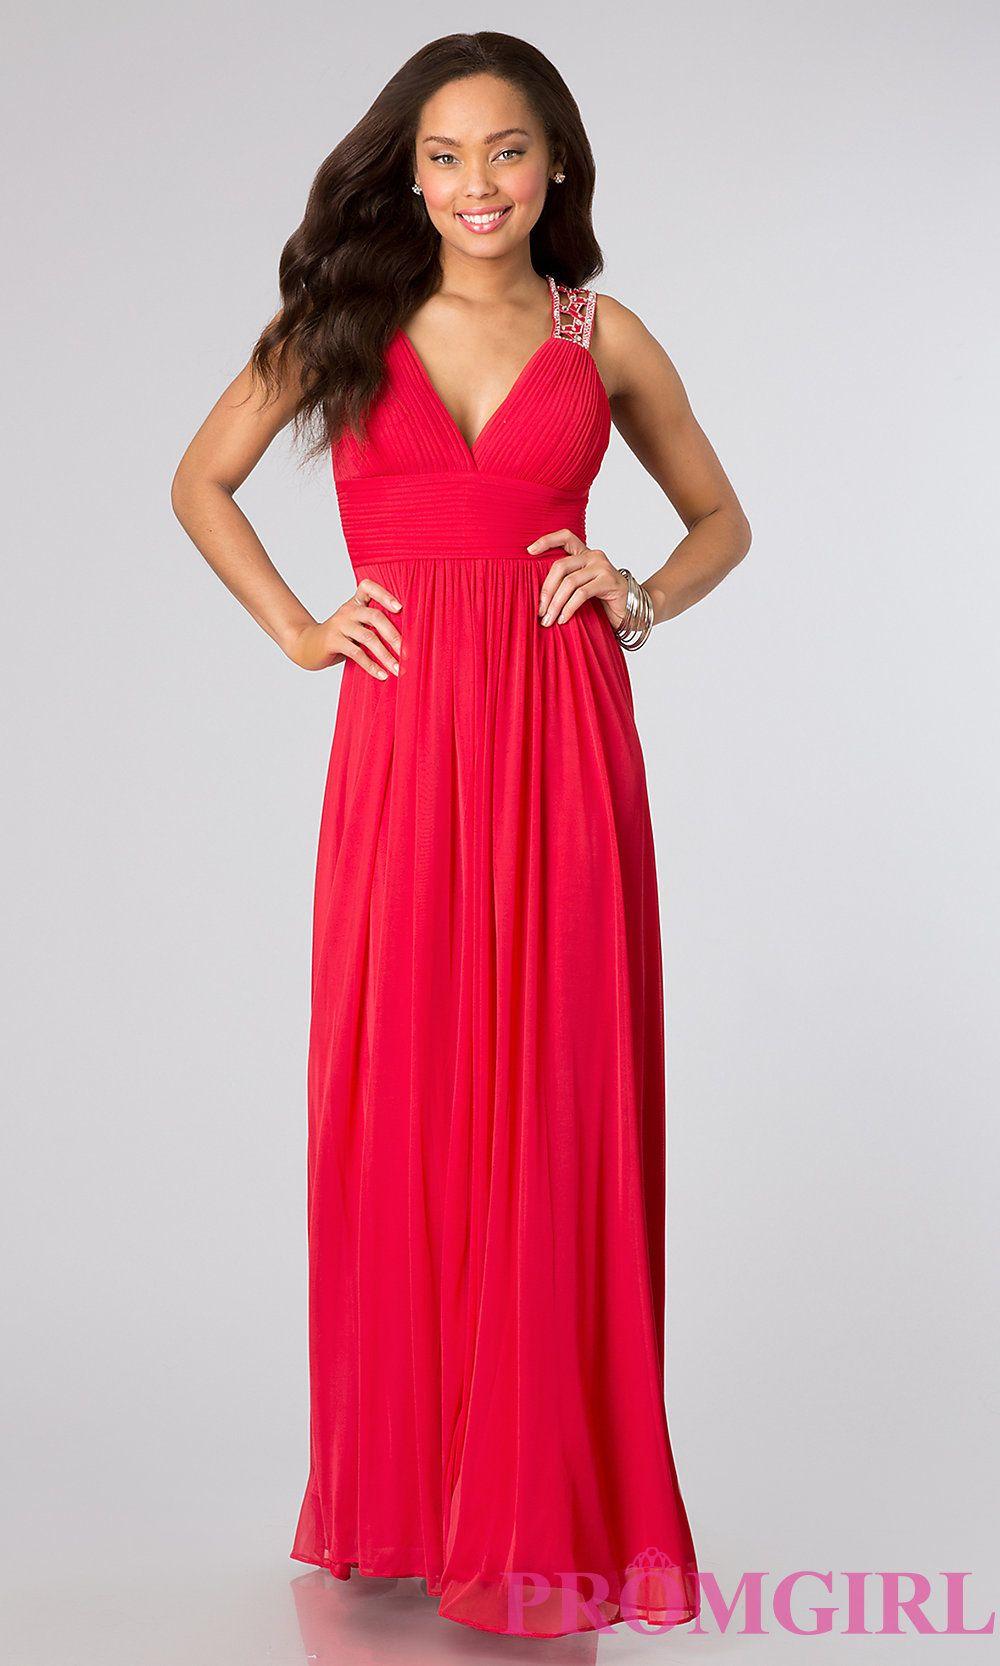 Long Prom Dress Style: BA-A13345 Video ! Tolle Rückseite